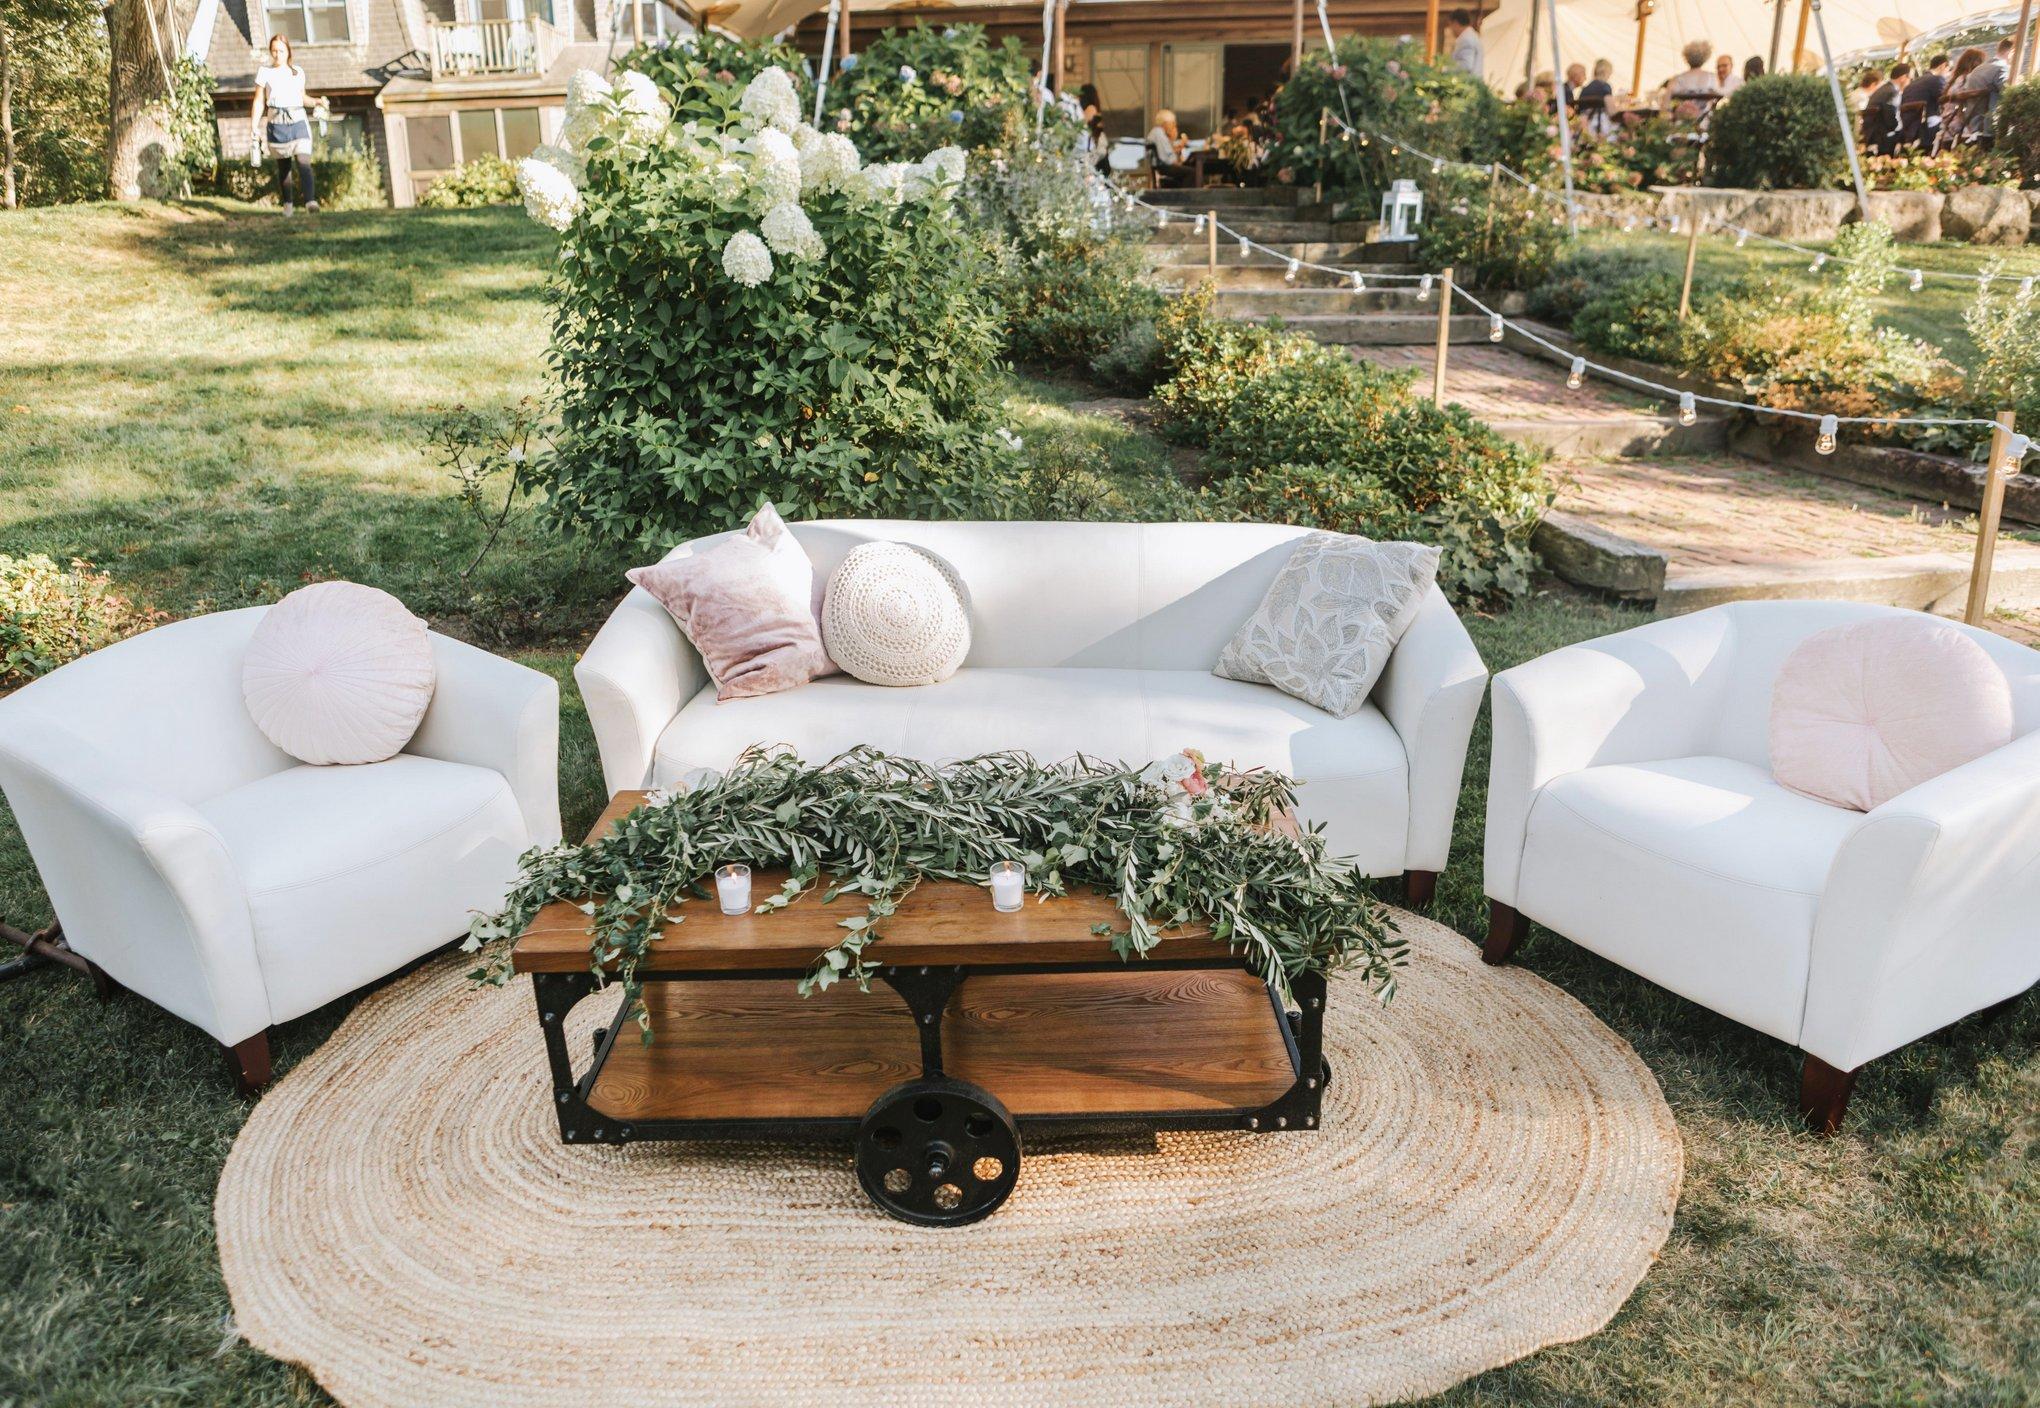 Marthas-Vineyard-Wedding-Photographer-Beach-Plum-Inn-37.jpg